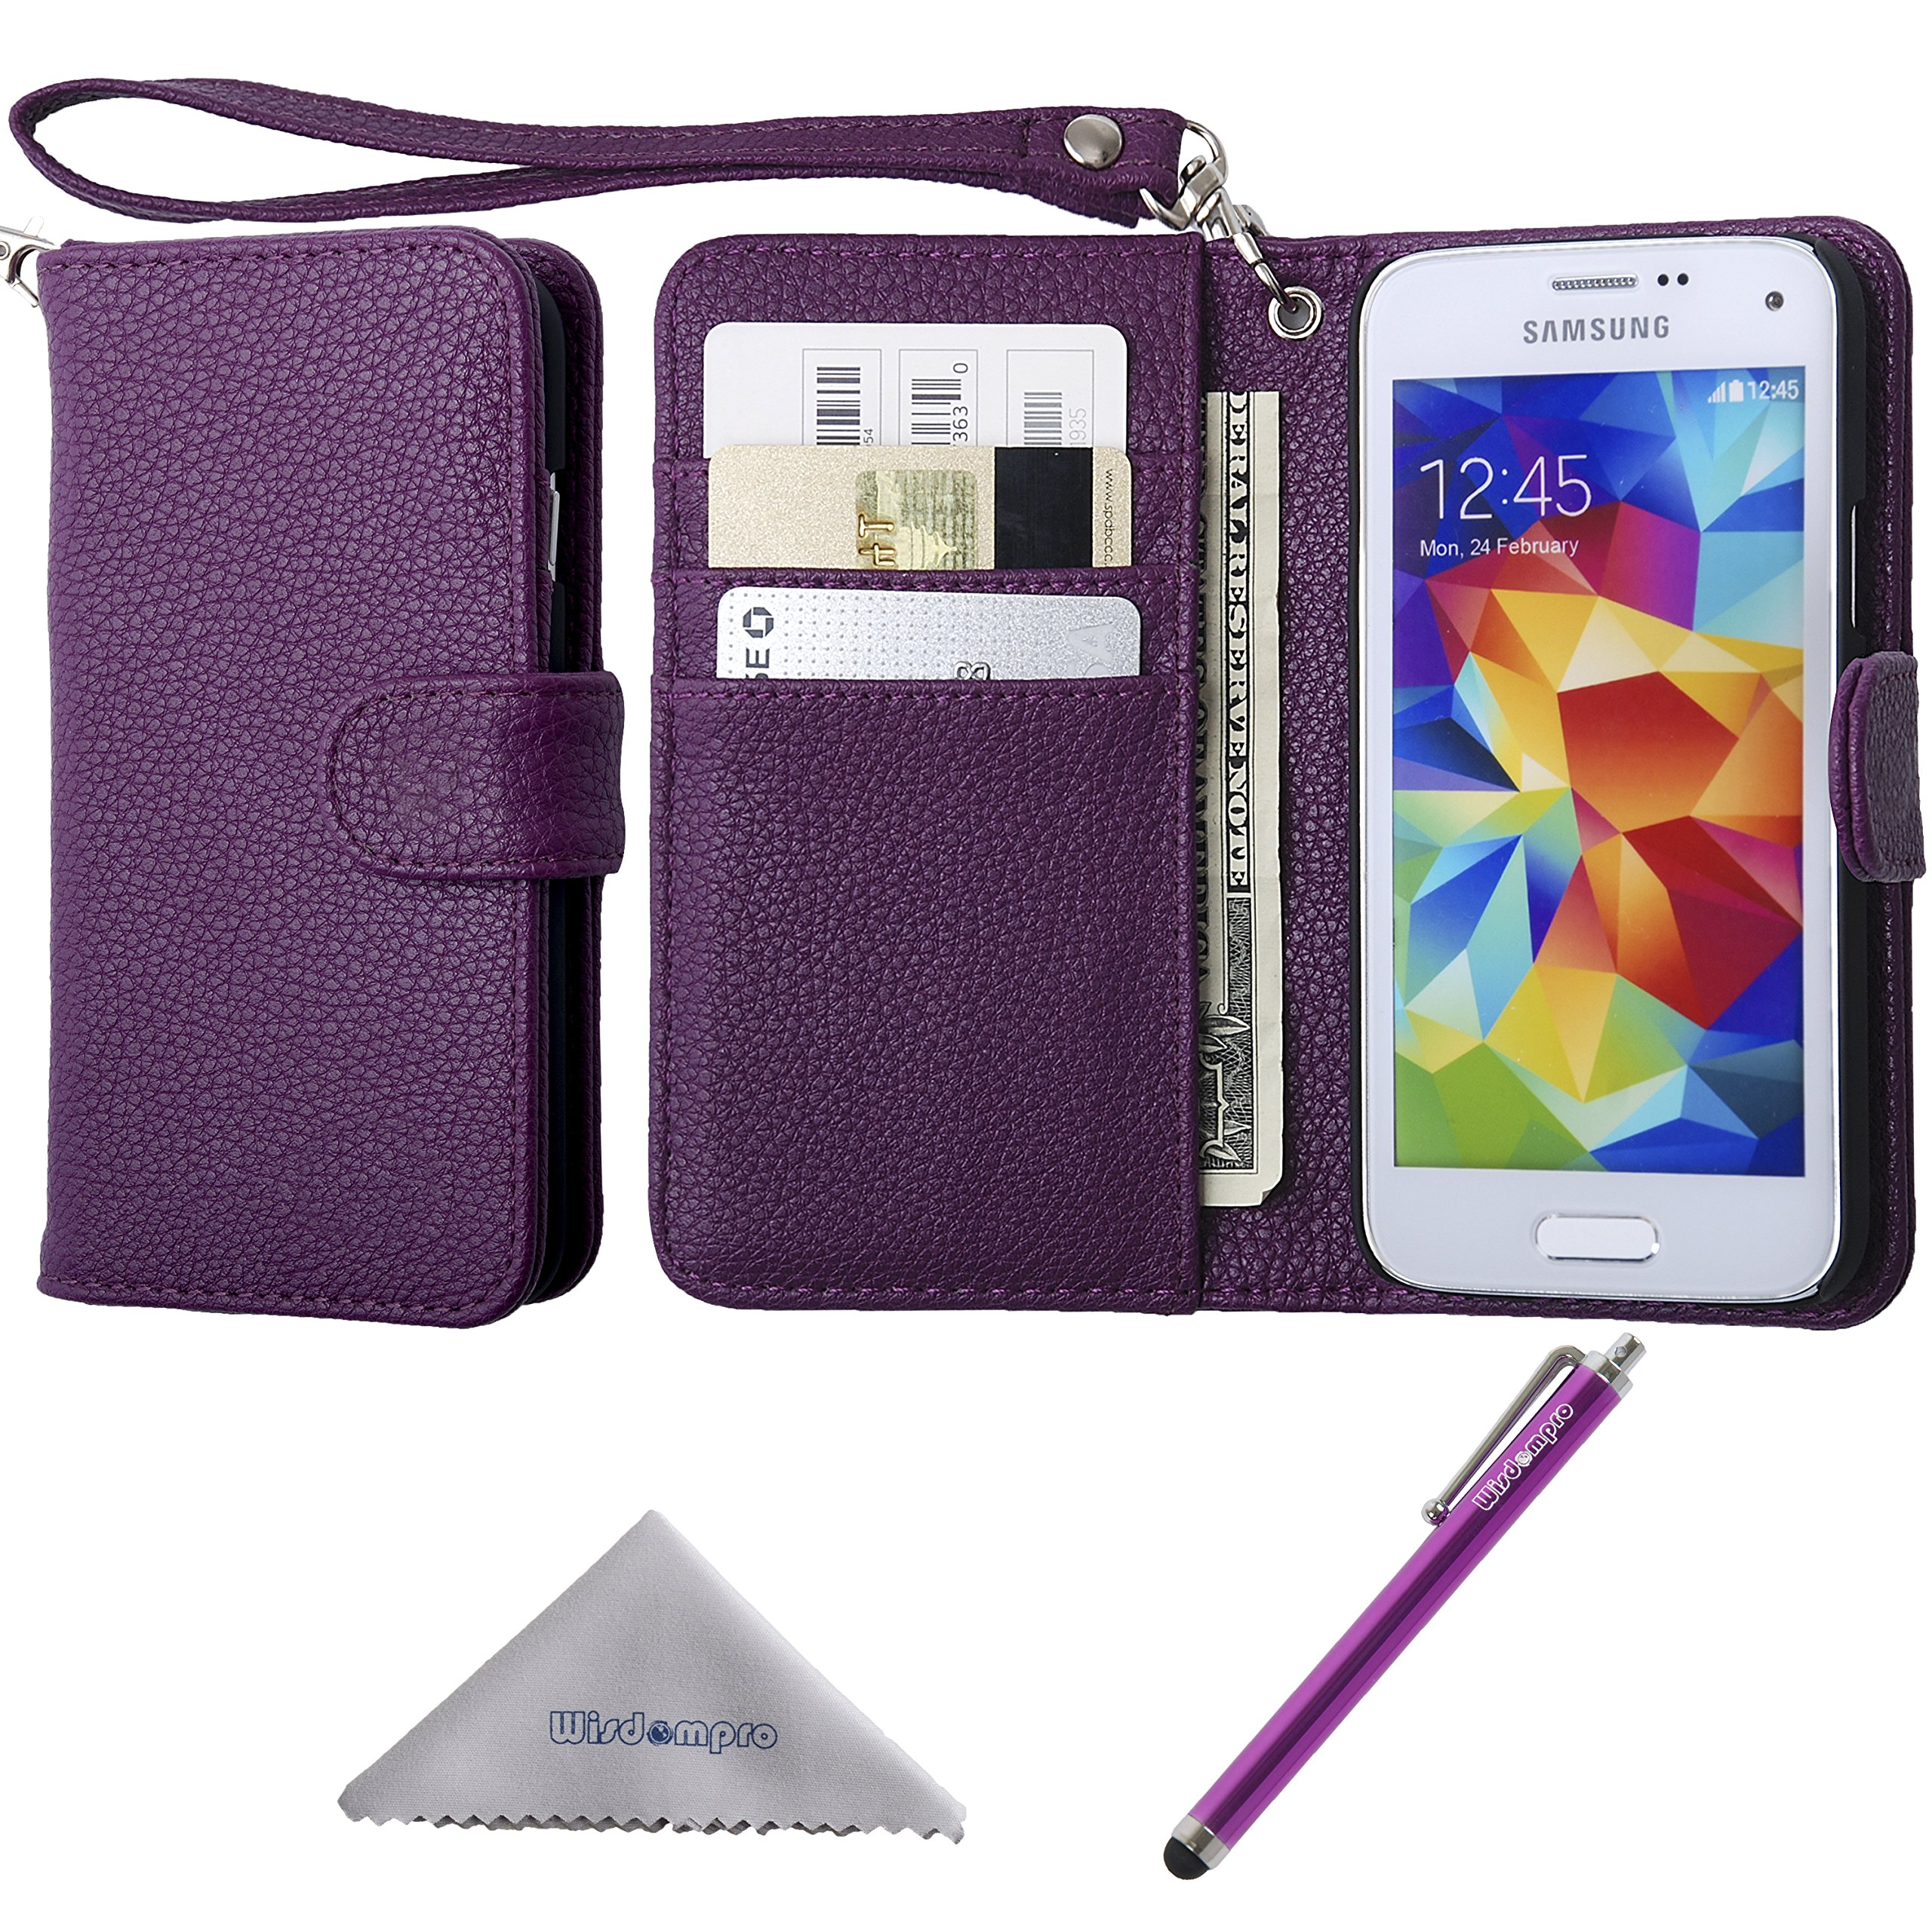 s5 mini cases amazon coms5 mini case, wisdompro premium pu leather protective [folio flip wallet] case with